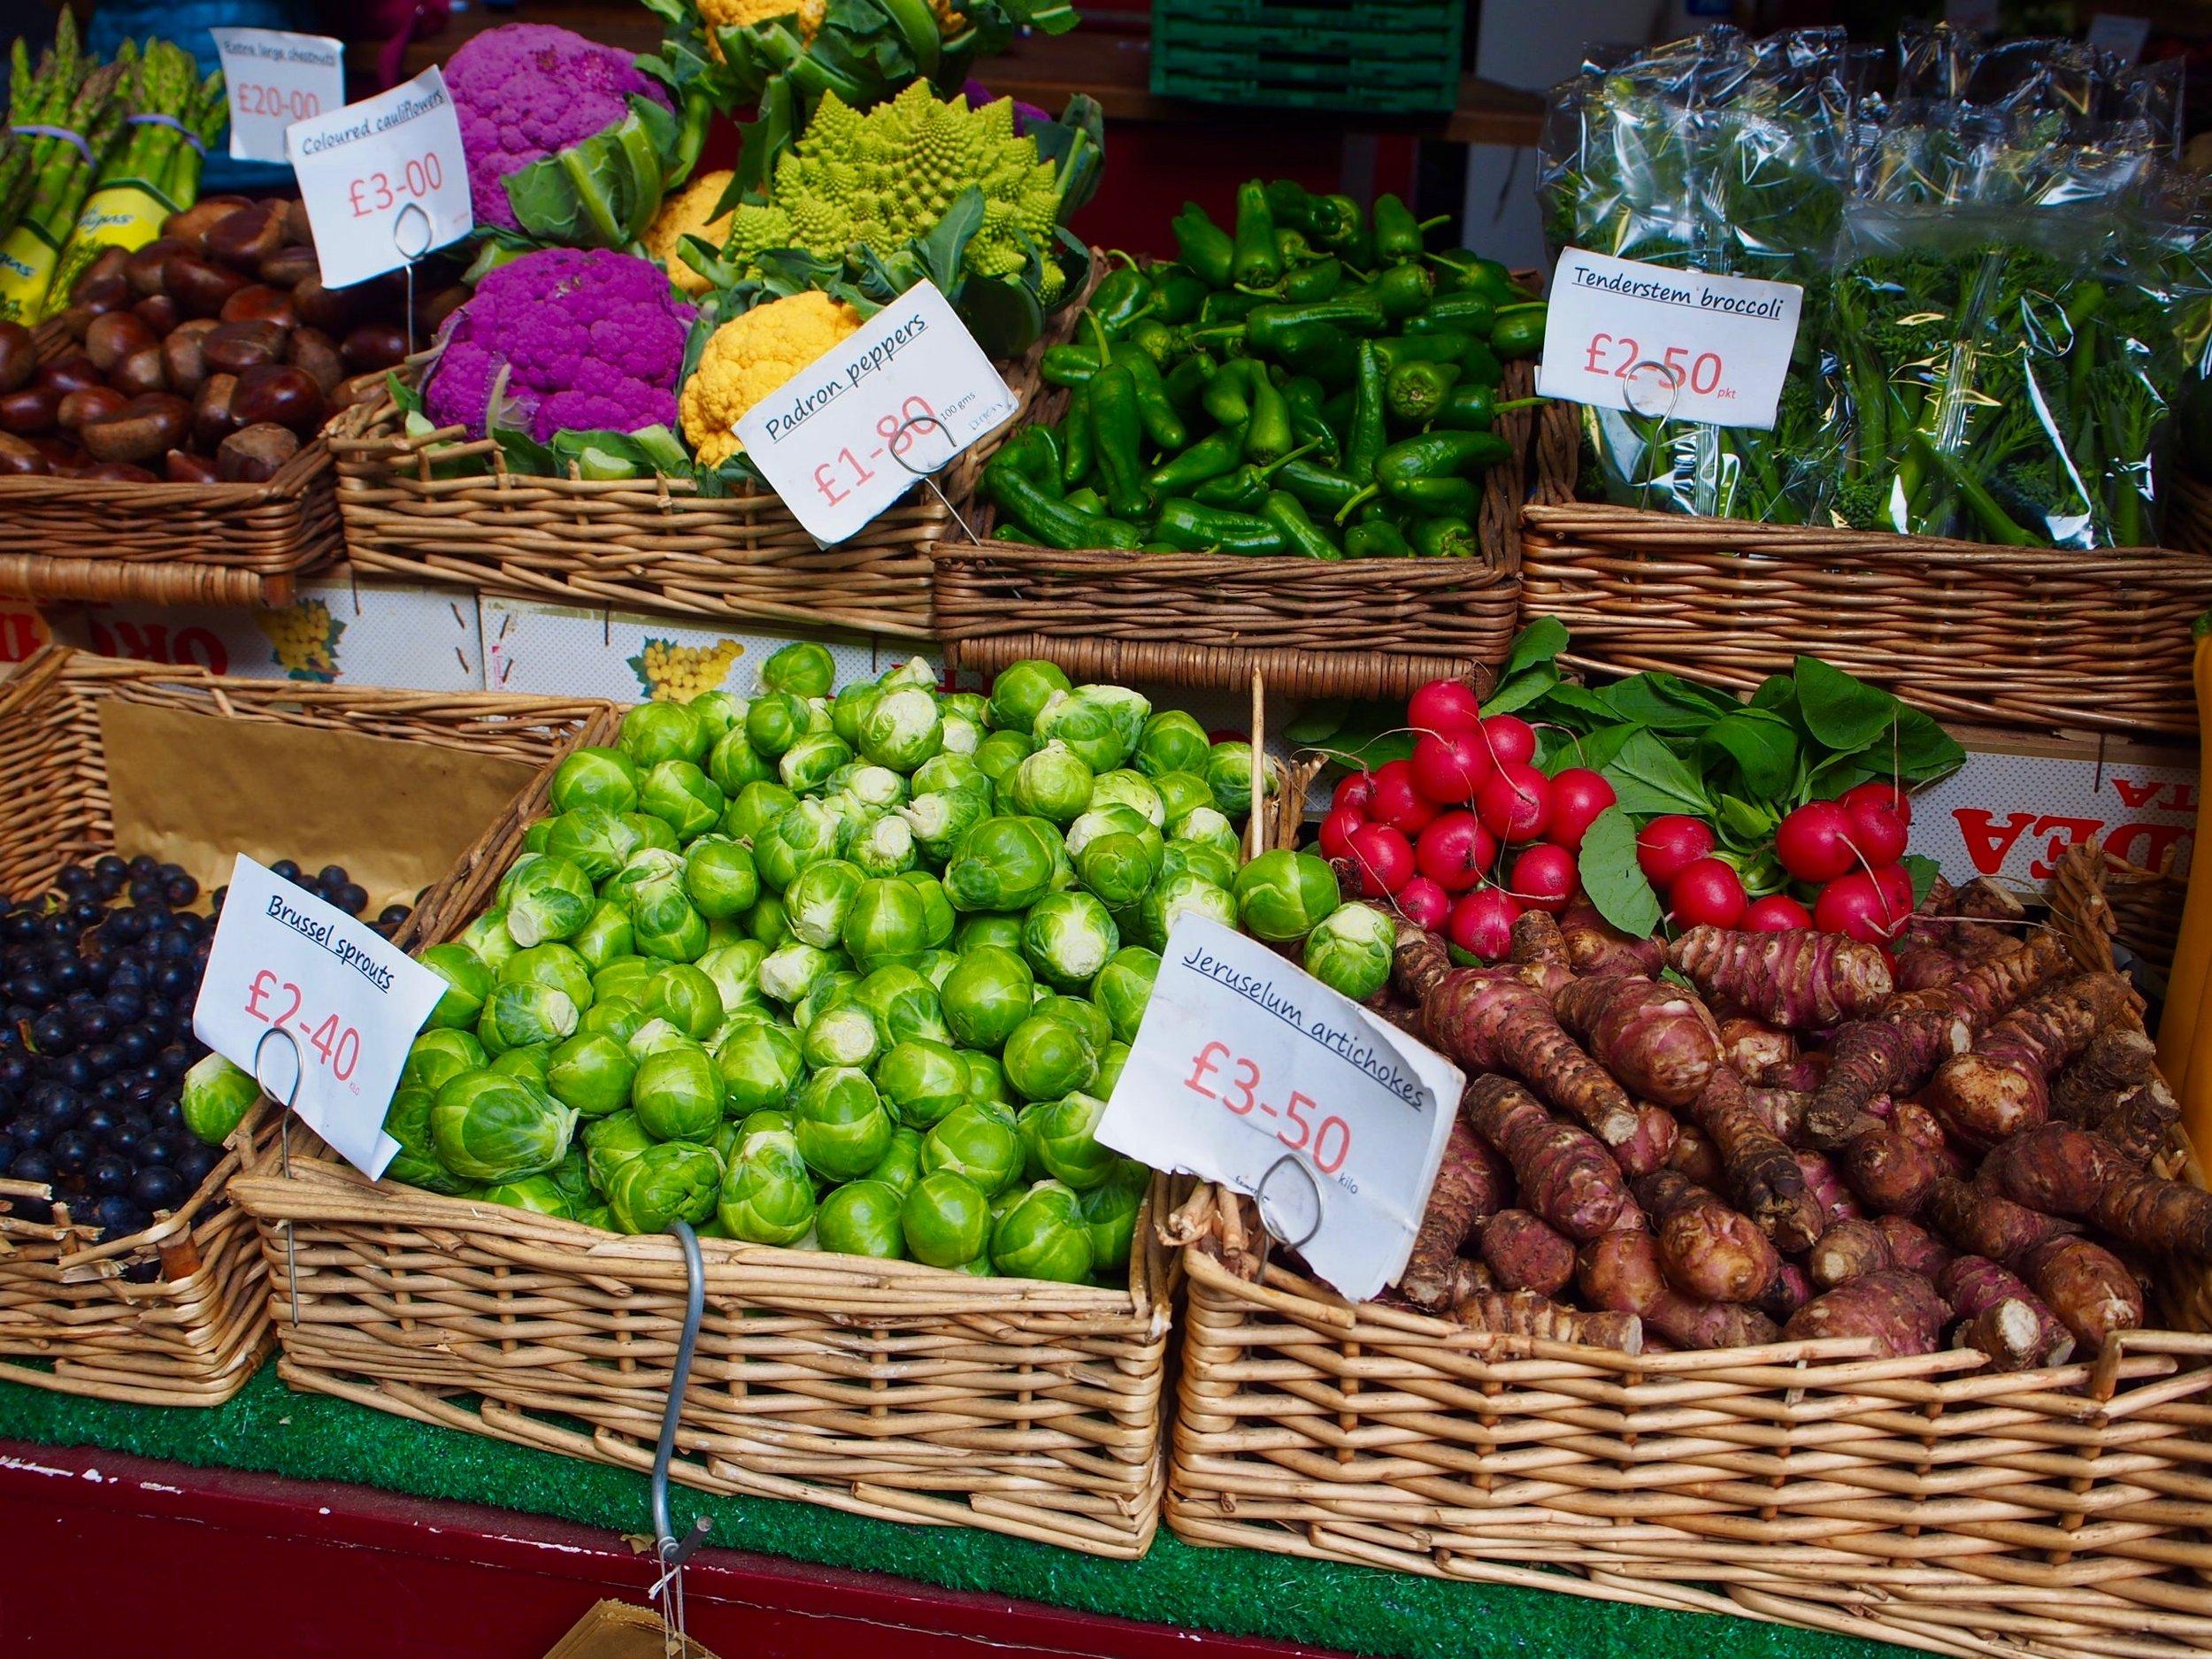 Vegetables at Borough Market